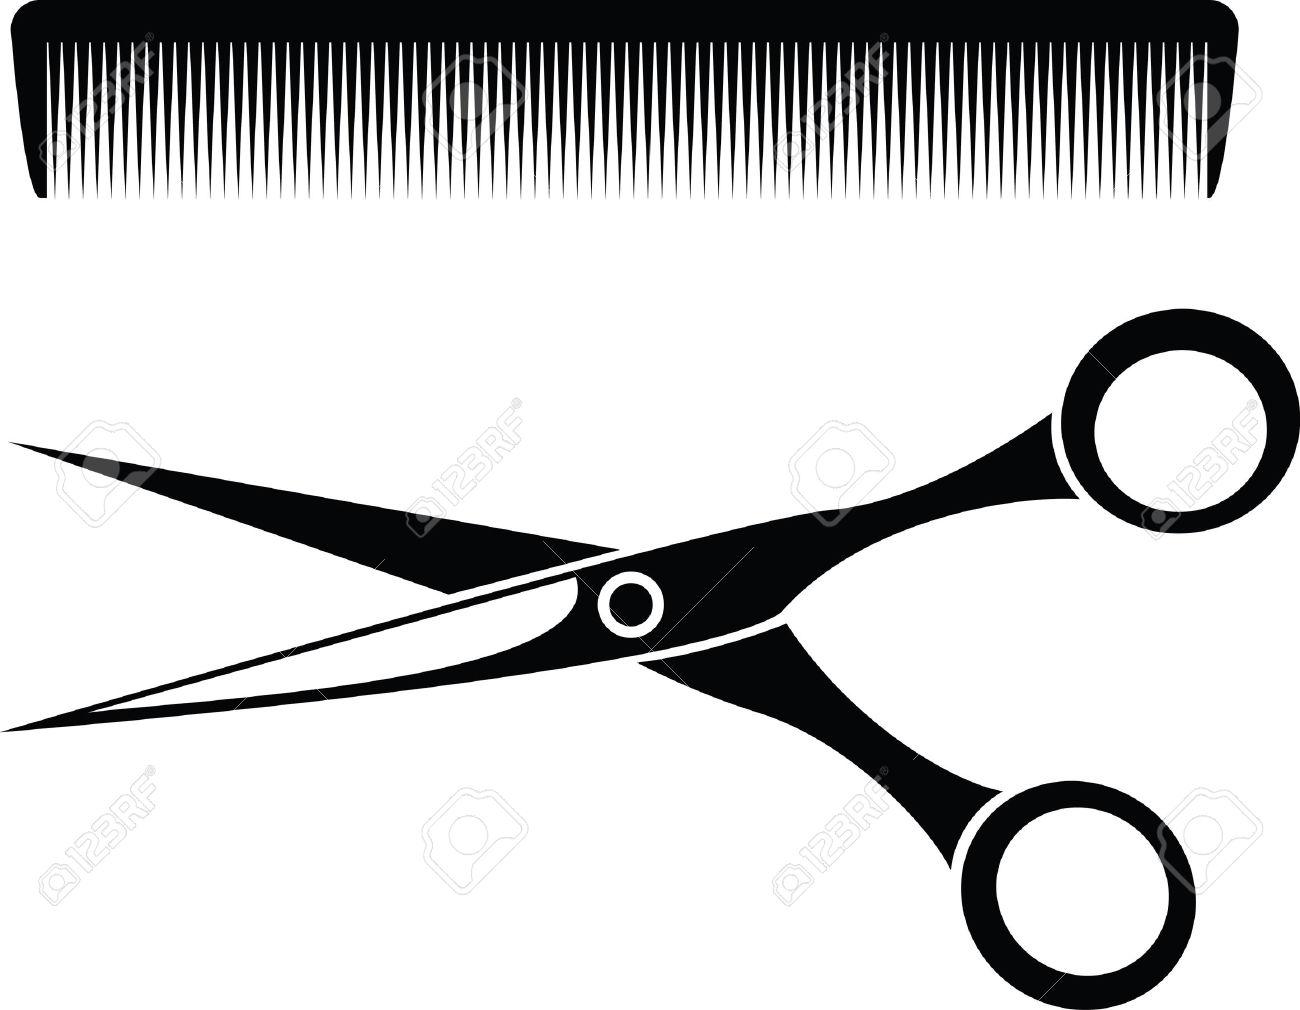 Hair clipart tool Barber Stock Barber 10 Vector